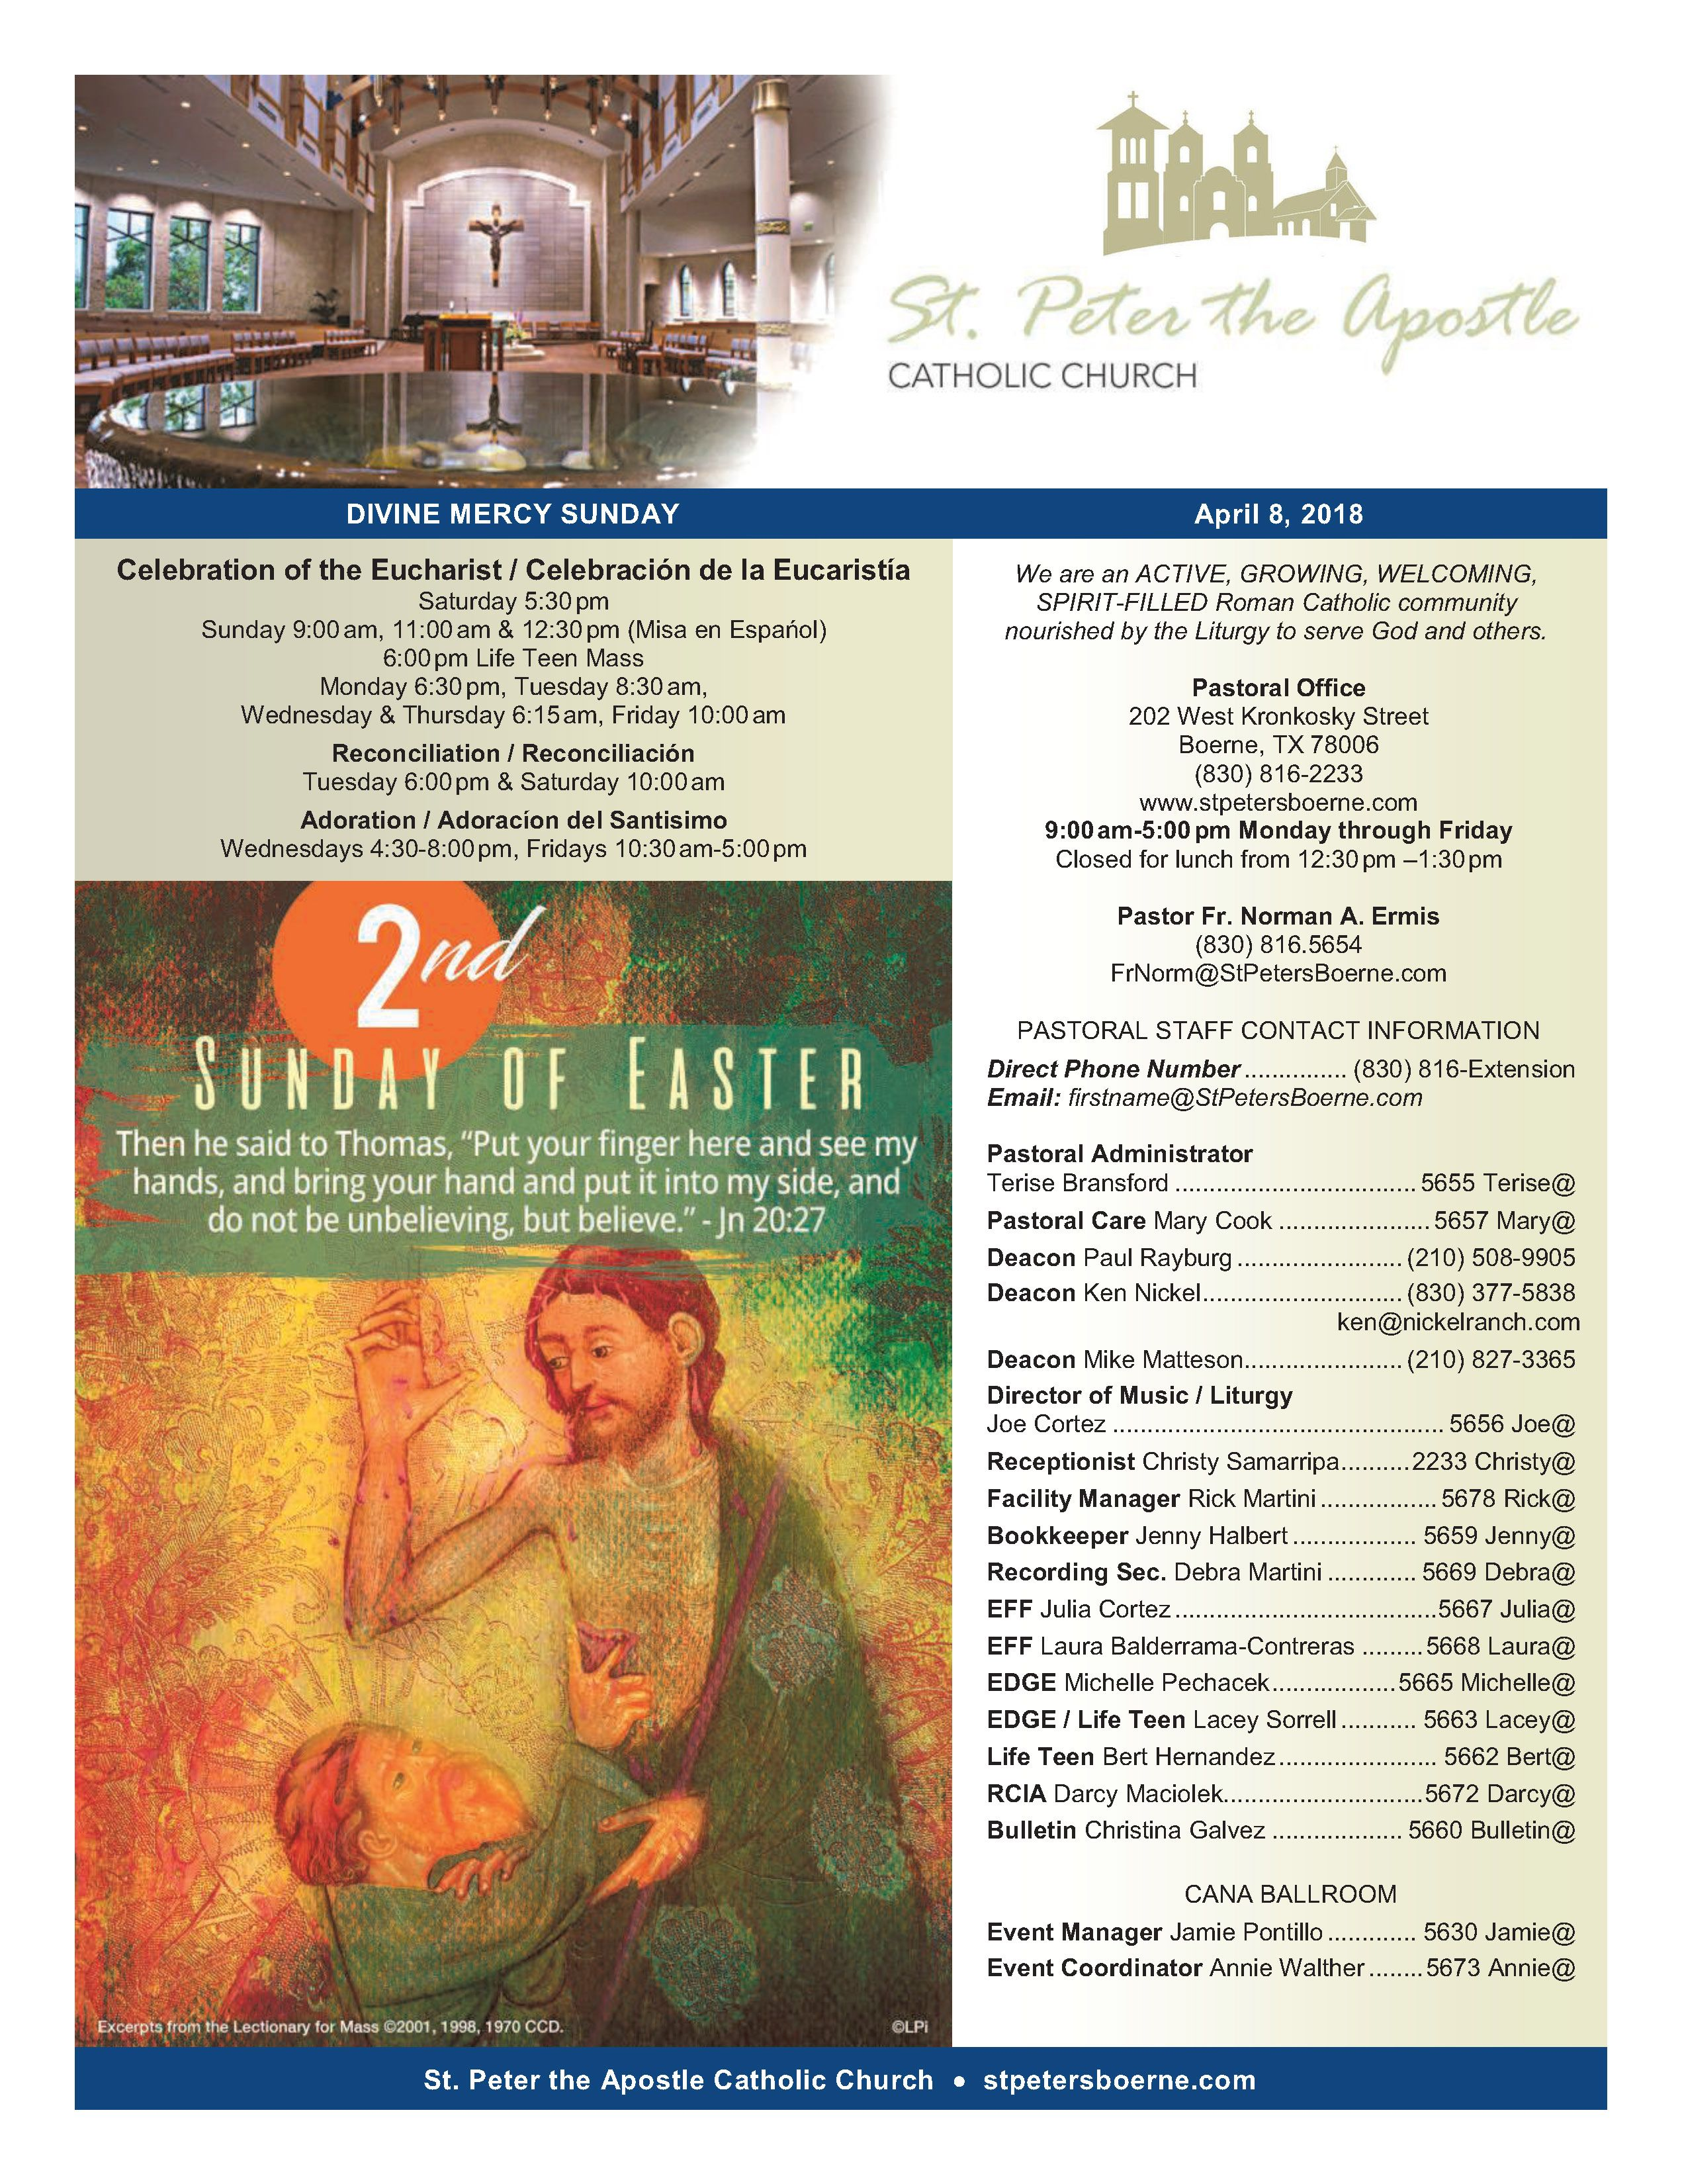 April 8, 2018 Bulletin Eucharist, Divine mercy, Divine